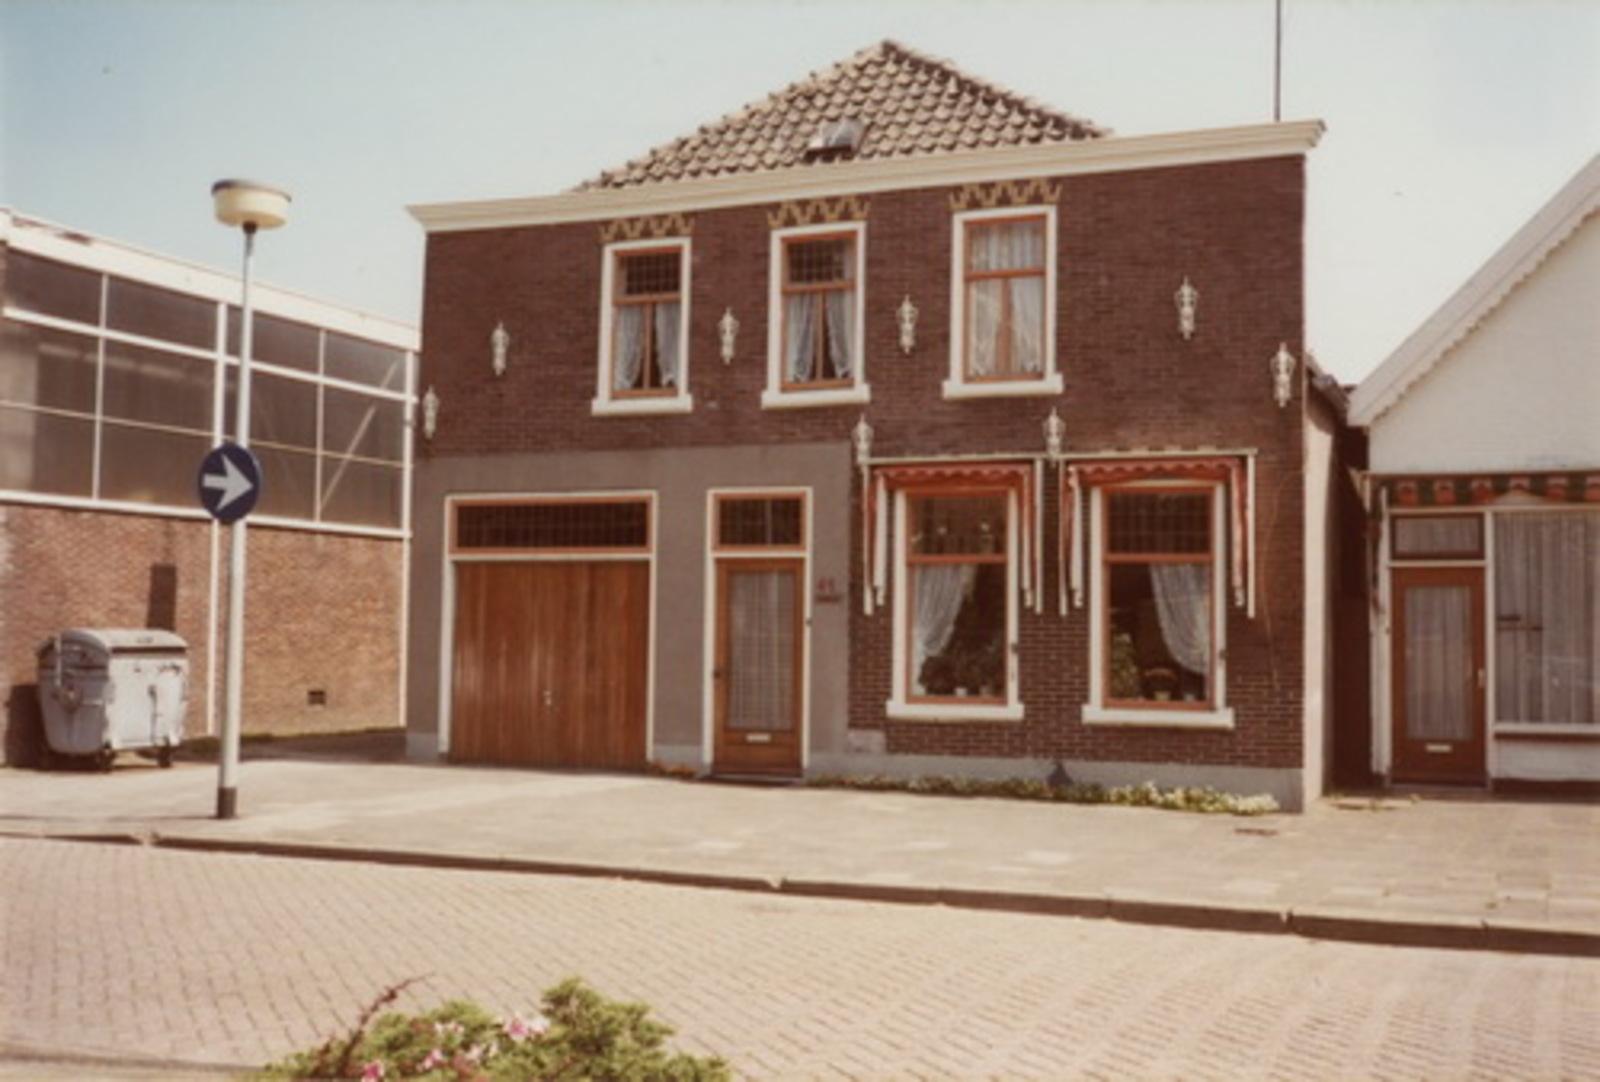 Marktplein N 0041 1983 huize fam E de Jonge